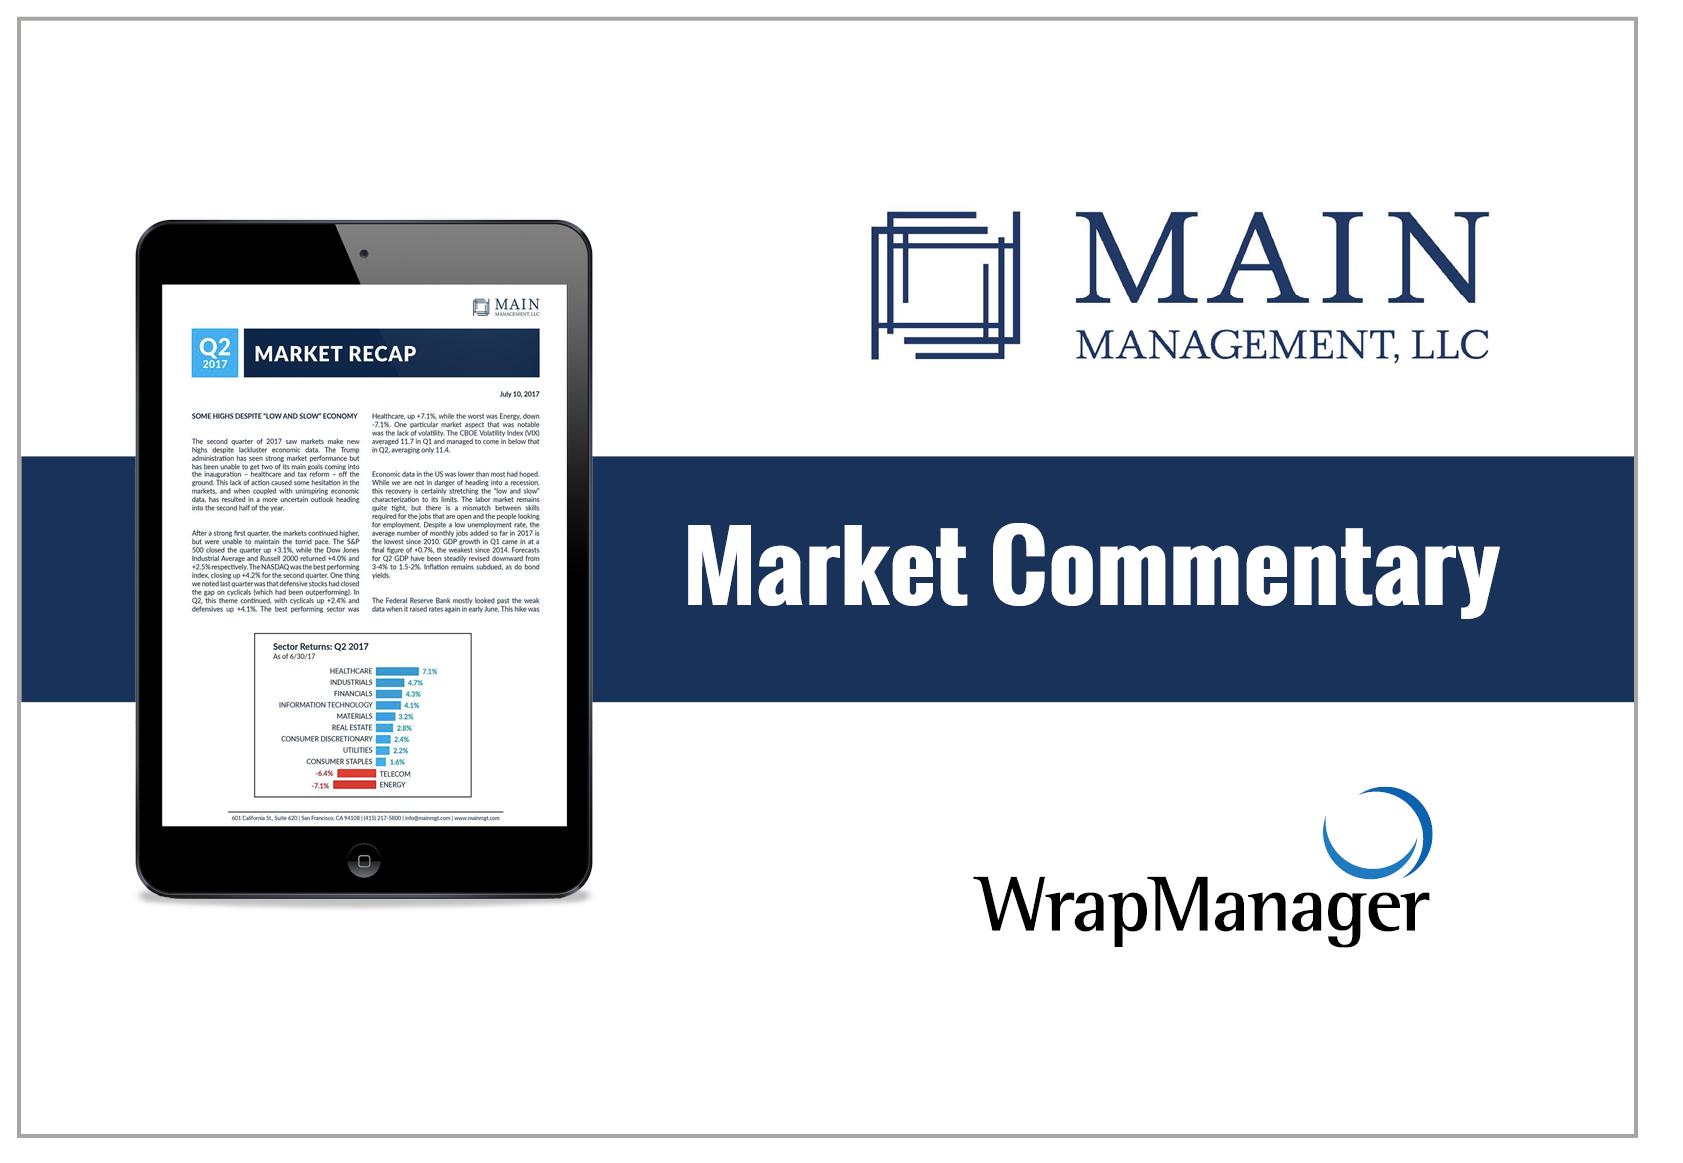 Main Management's Q2 2018 Market Recap